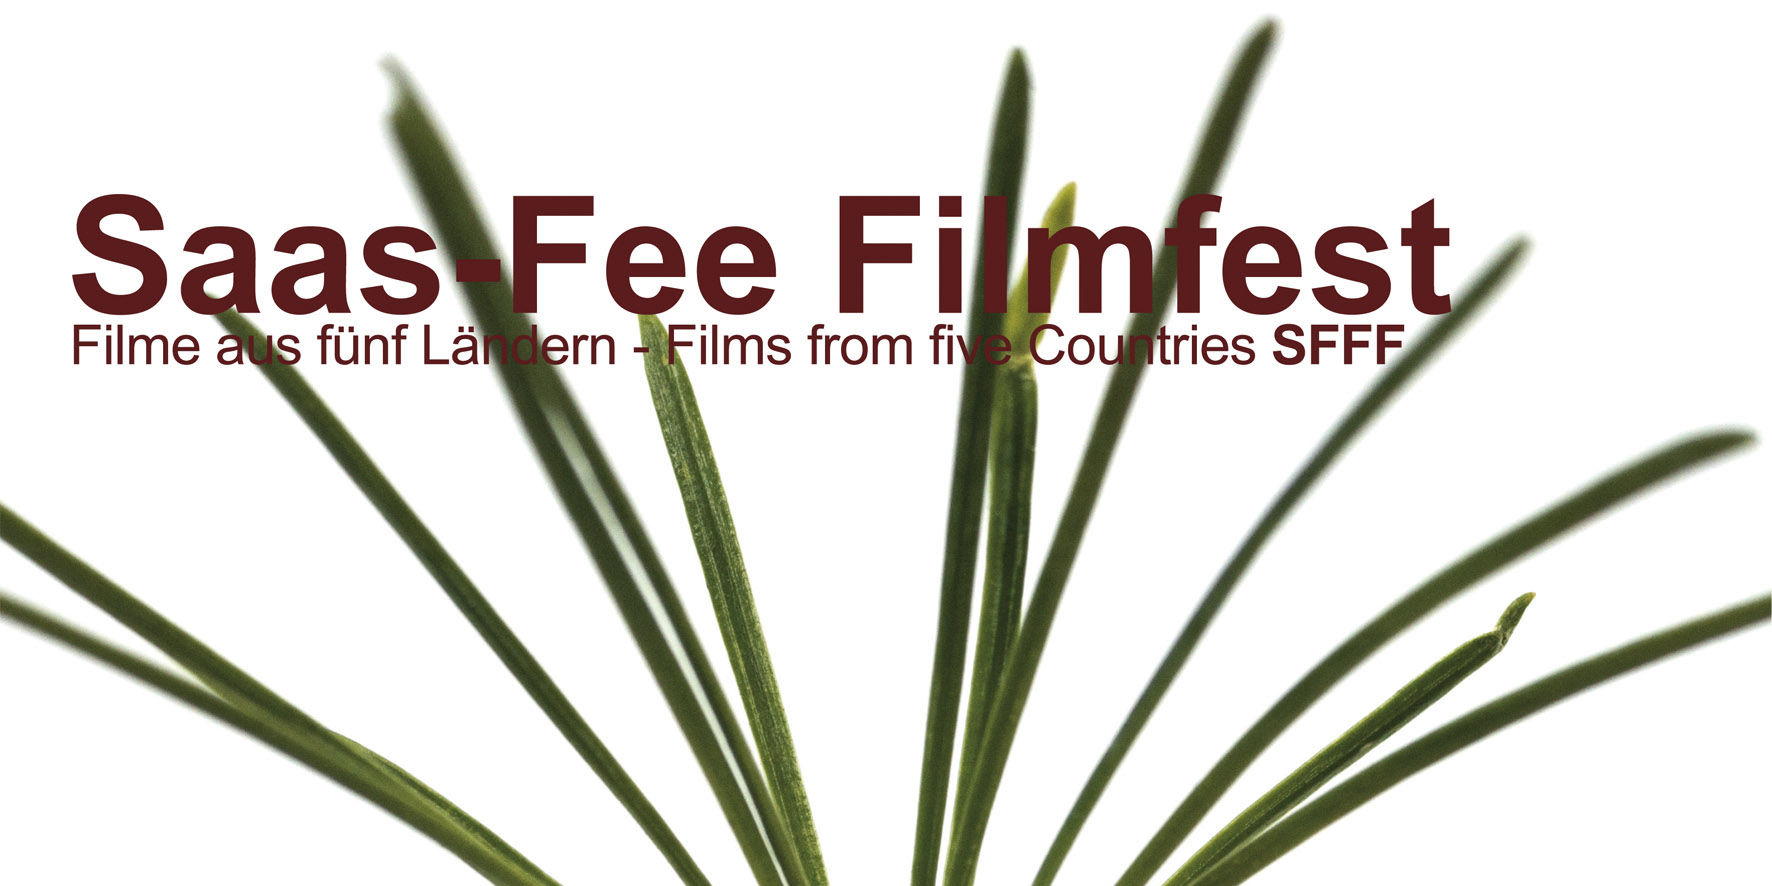 2. Saas-Fee Filmfest in der Freien Ferienrepublik Saas-Fee